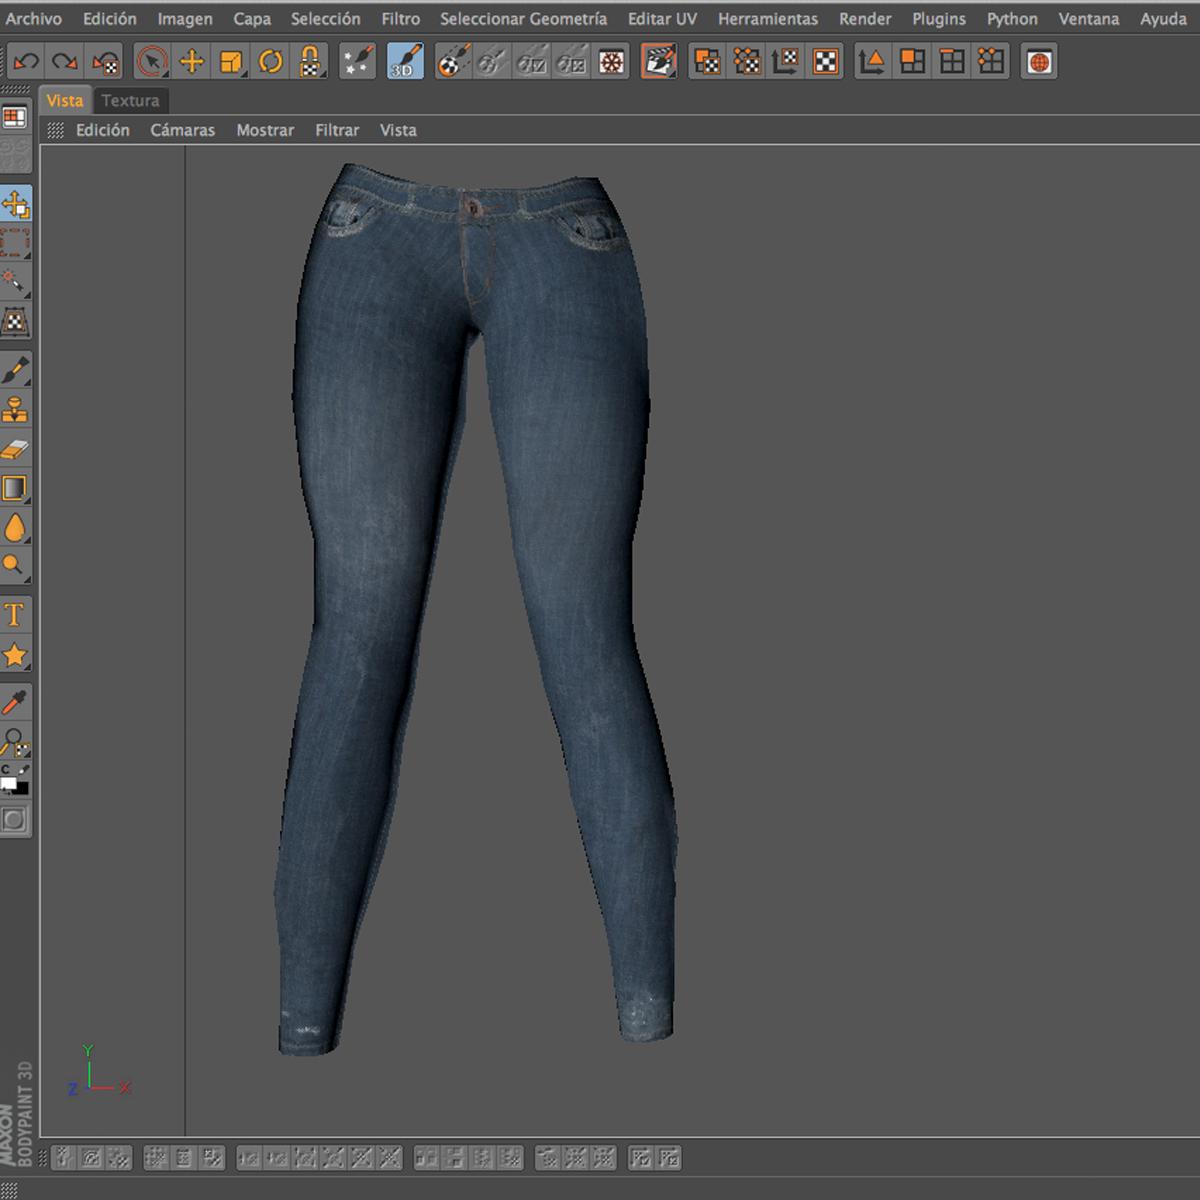 female jeans 3d model 3ds max fbx c4d ma mb obj 160414